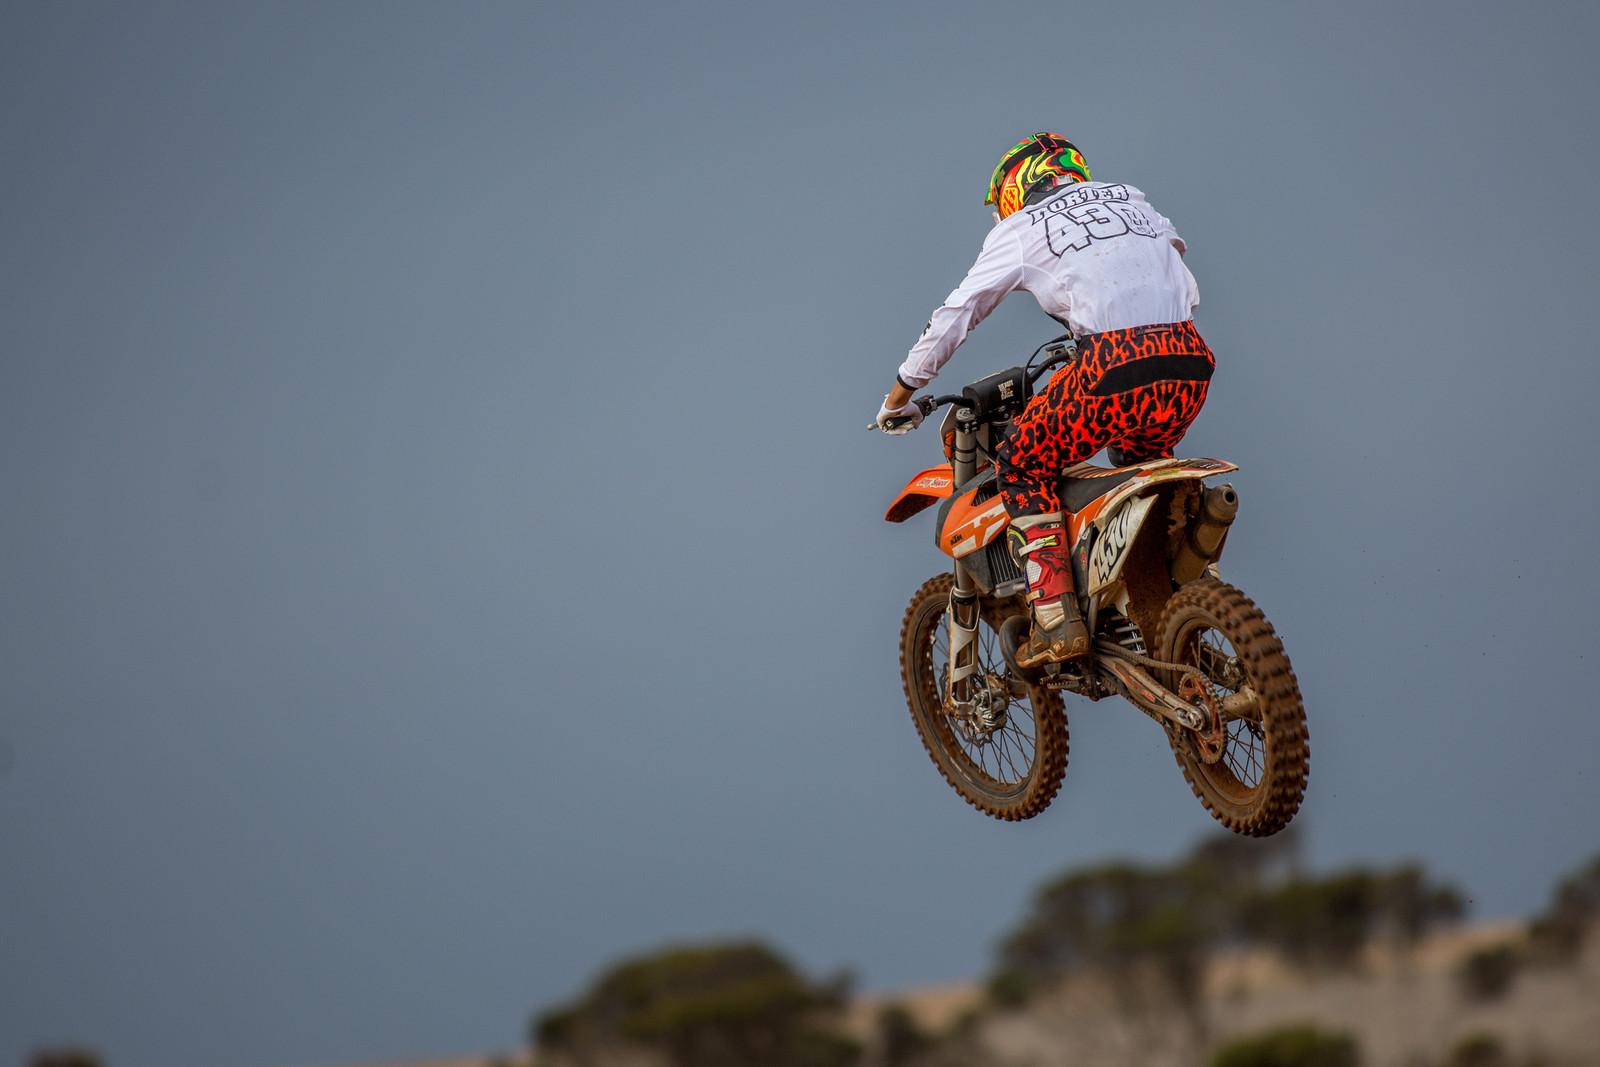 Dean Porter - Australian Motul Mx Championships: Round 4, Murray Bridge - Motocross Pictures - Vital MX